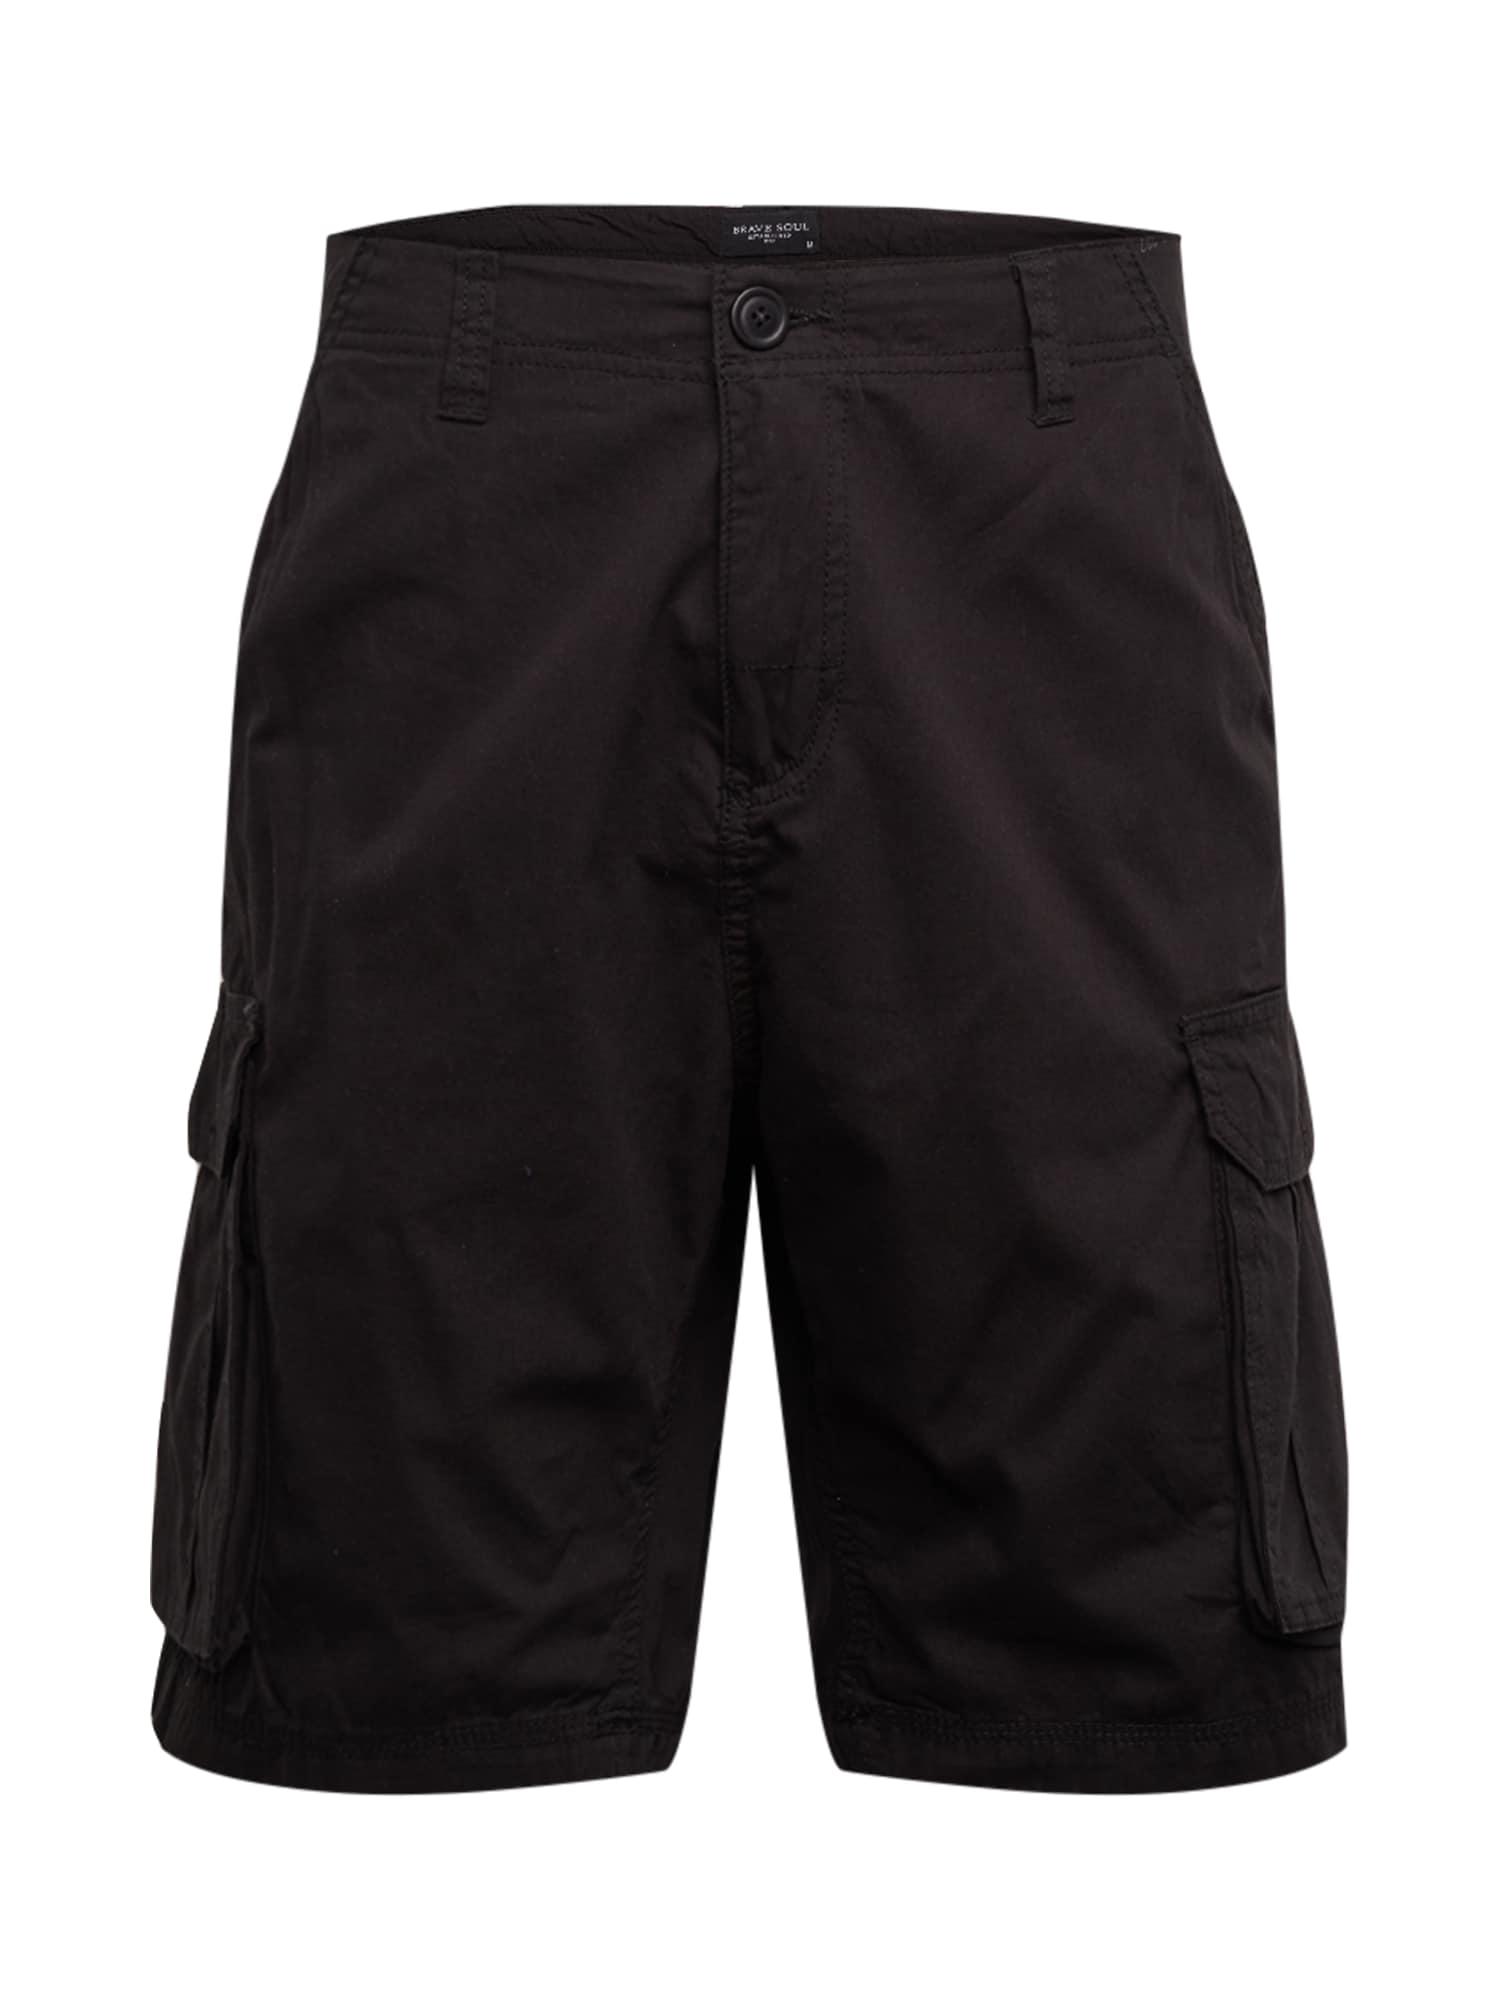 BRAVE SOUL Laisvo stiliaus kelnės 'MSRT-RIVERWOPKA' juoda